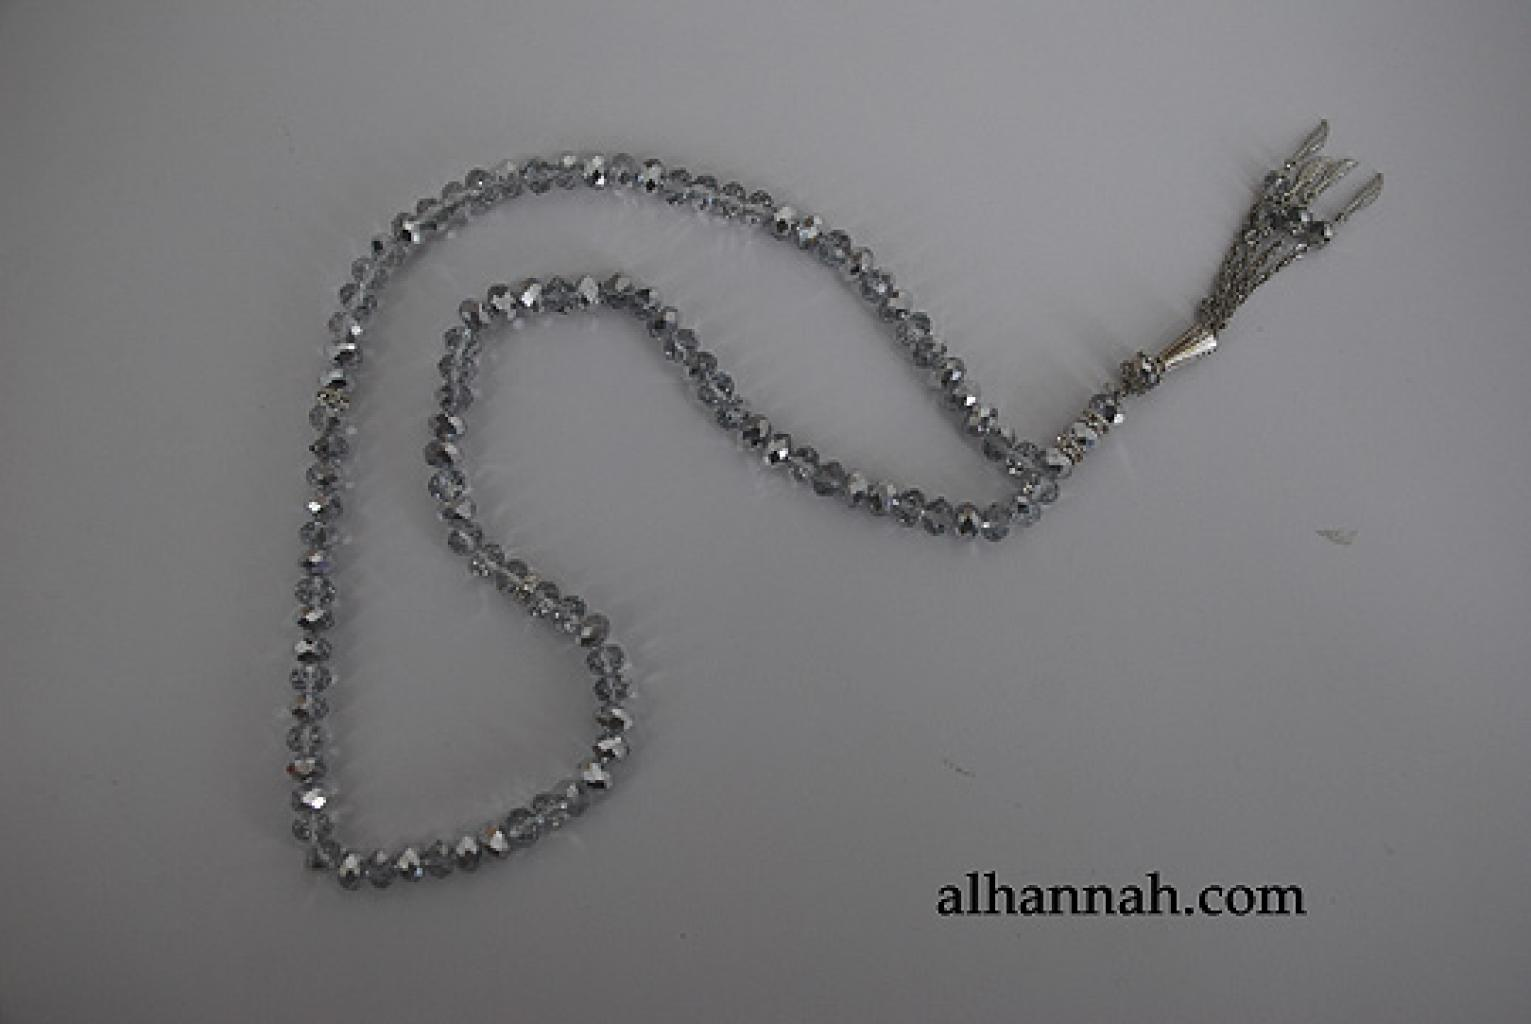 Premium Metallic Cut-Crystal Prayer Beads ii973